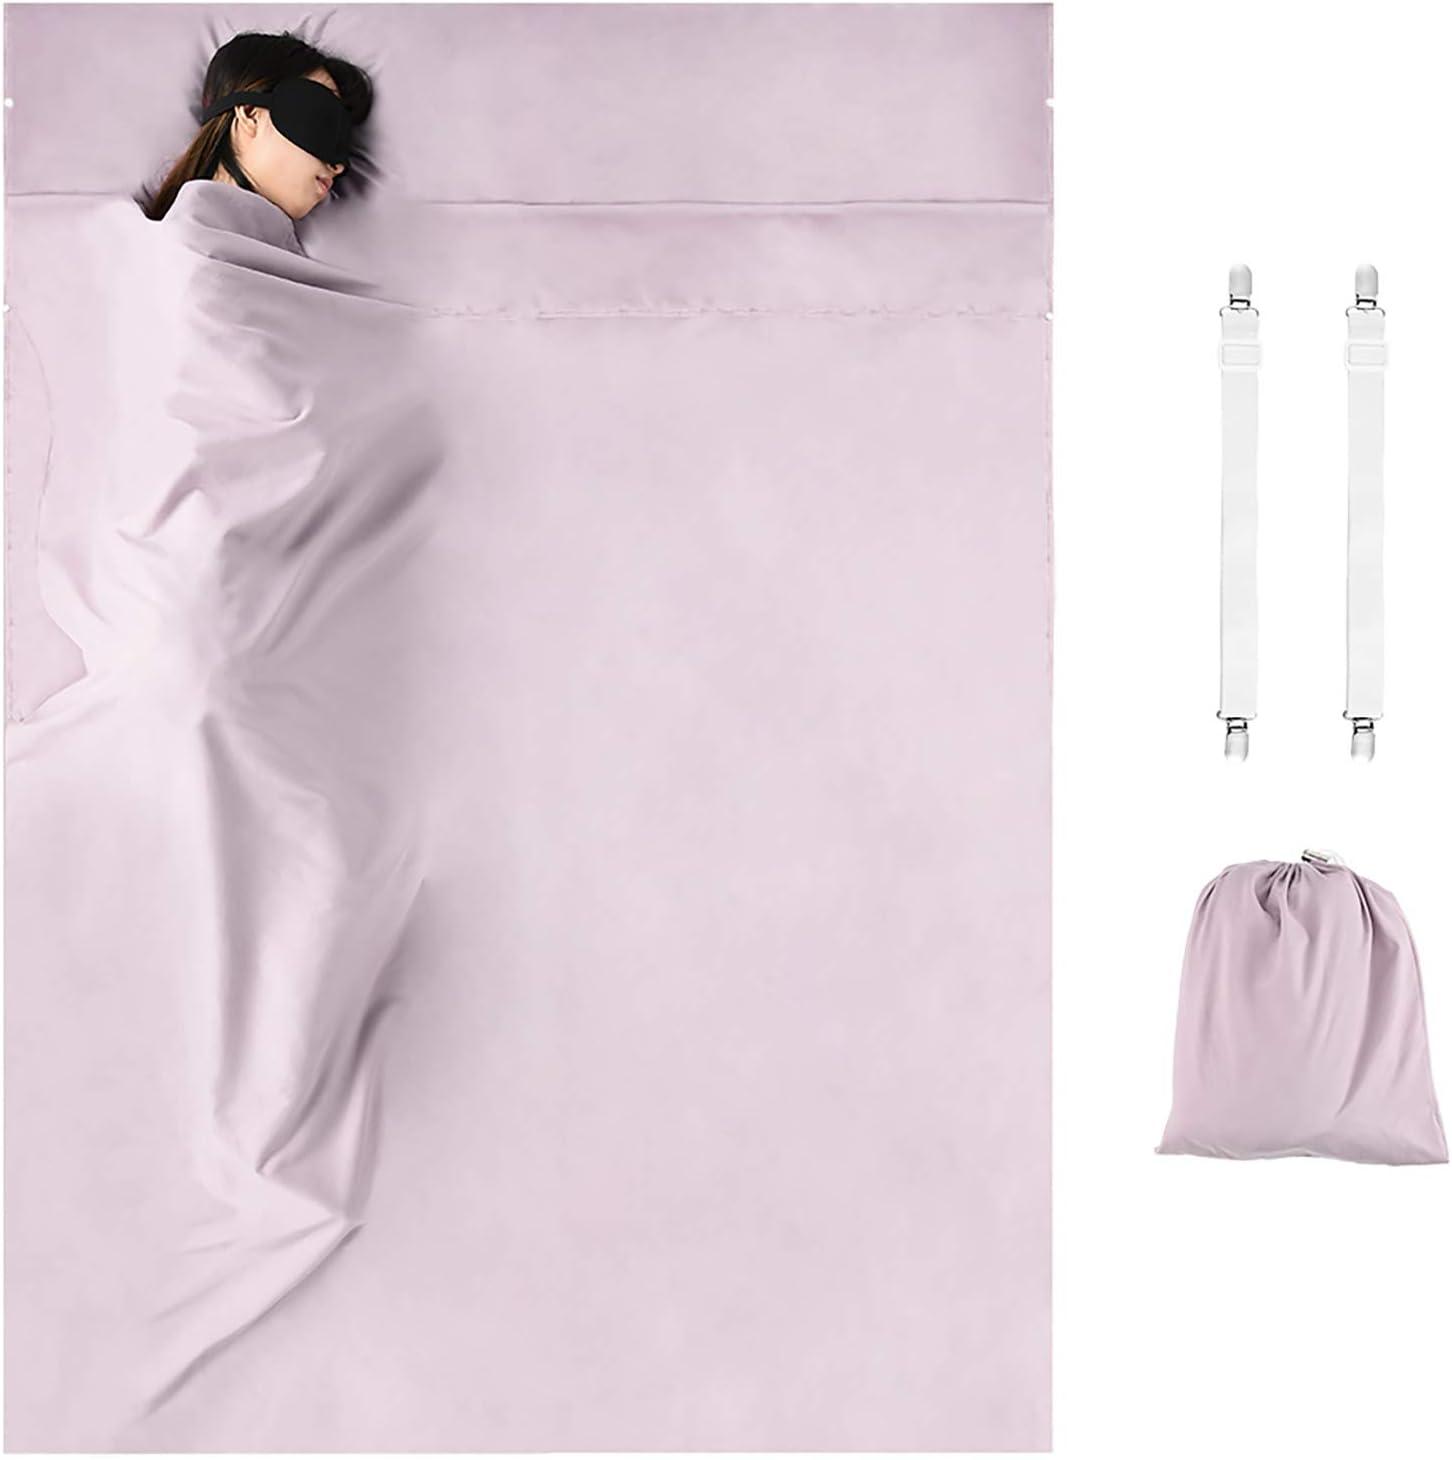 Wilxaw Sleeping Bag 180 x 210 cm, Travel Sleeping Bag Ultralight with Pillow Case